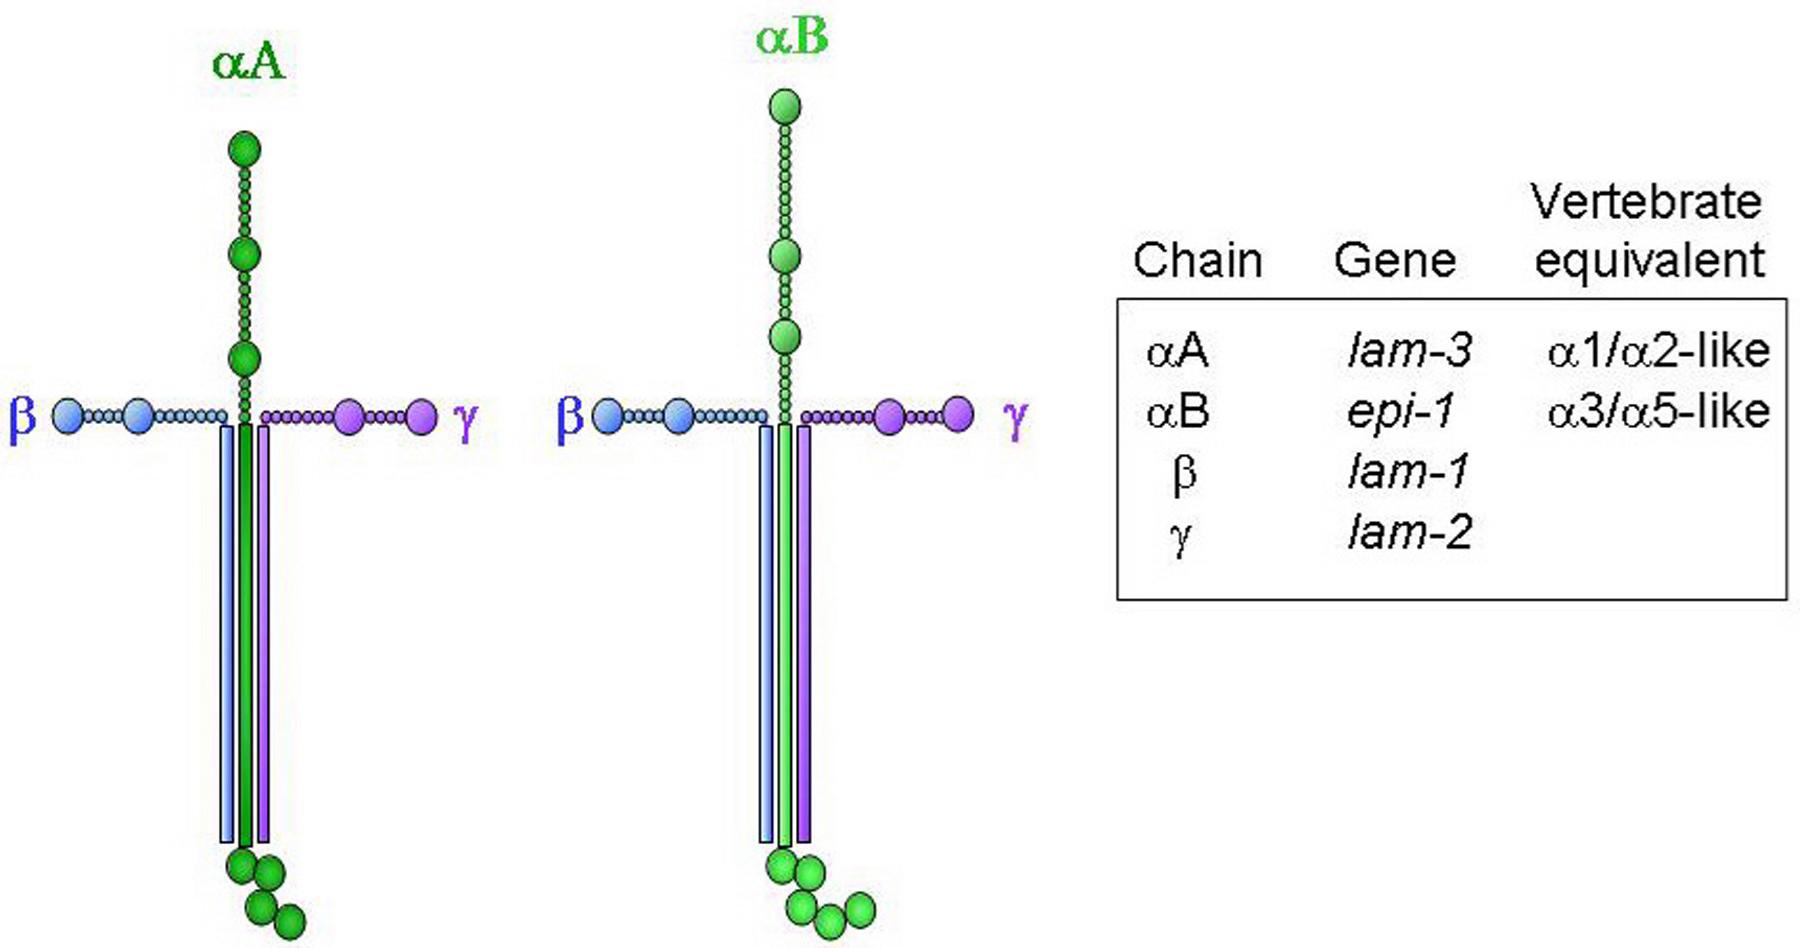 basement membranes rh wormbook org Laminin Under Microscope laminin molecule structure